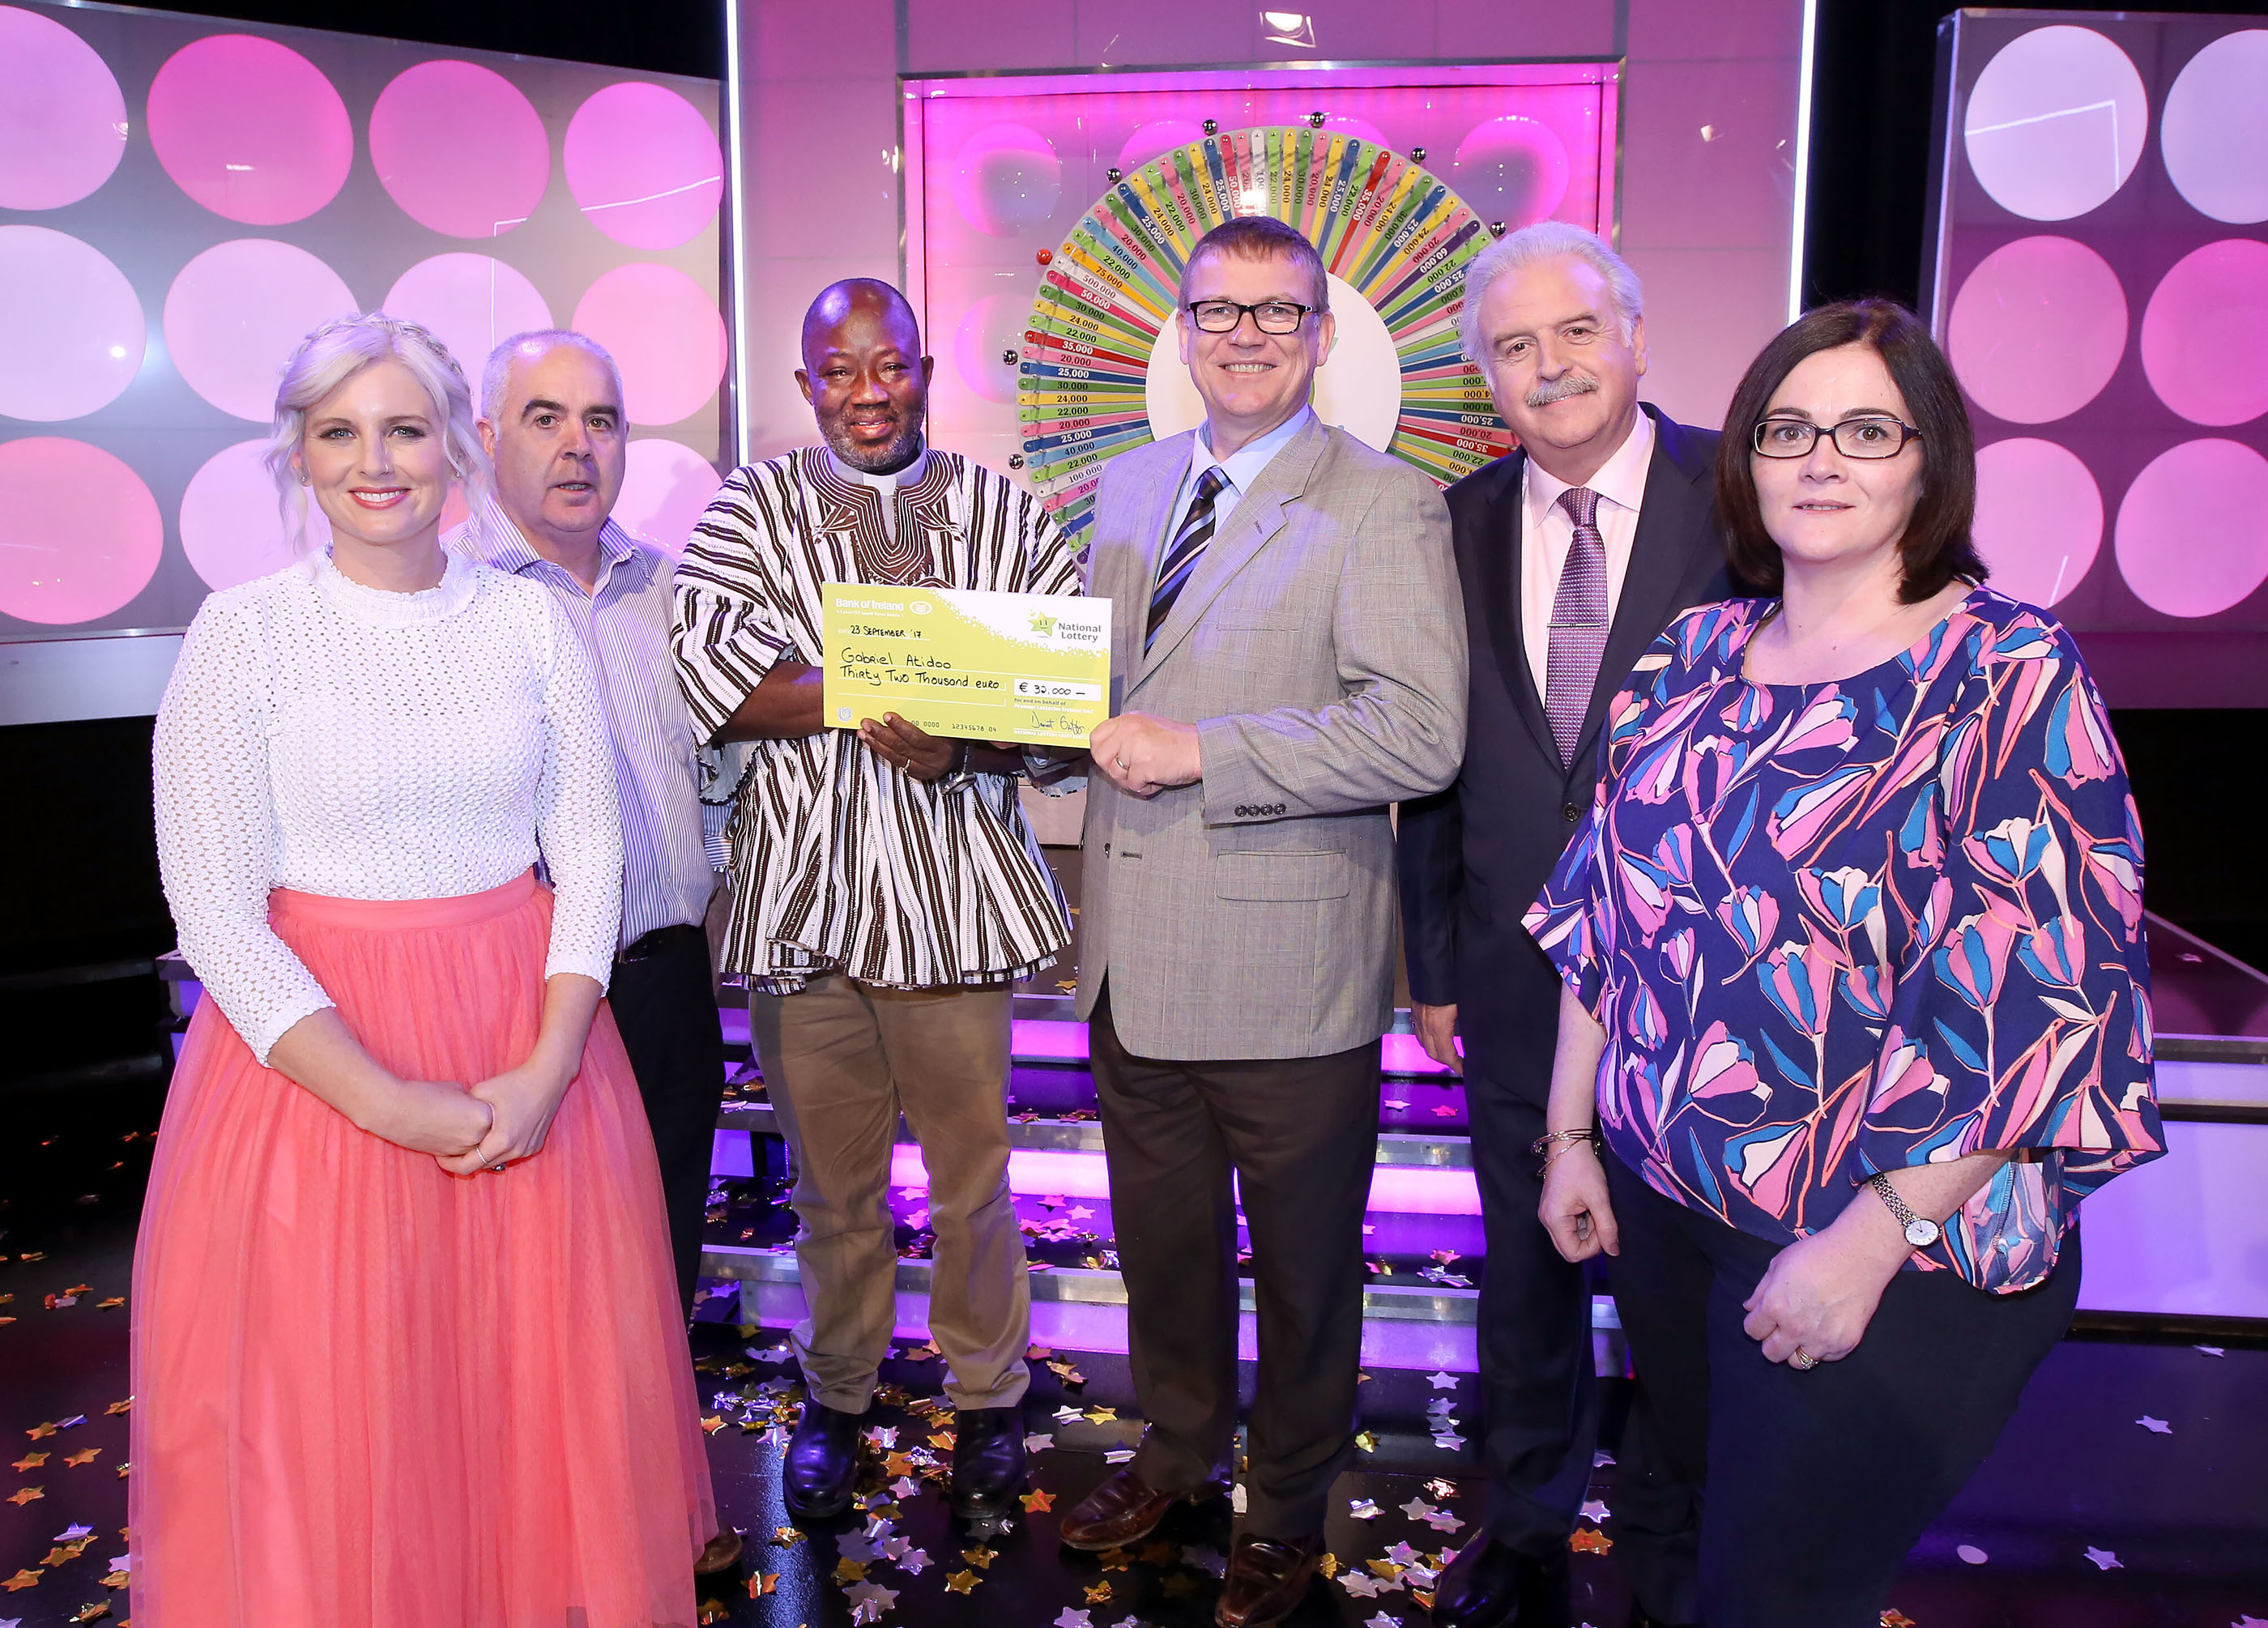 Two Co Kildare contestants win over €65k on Winning Streak - Photo 1